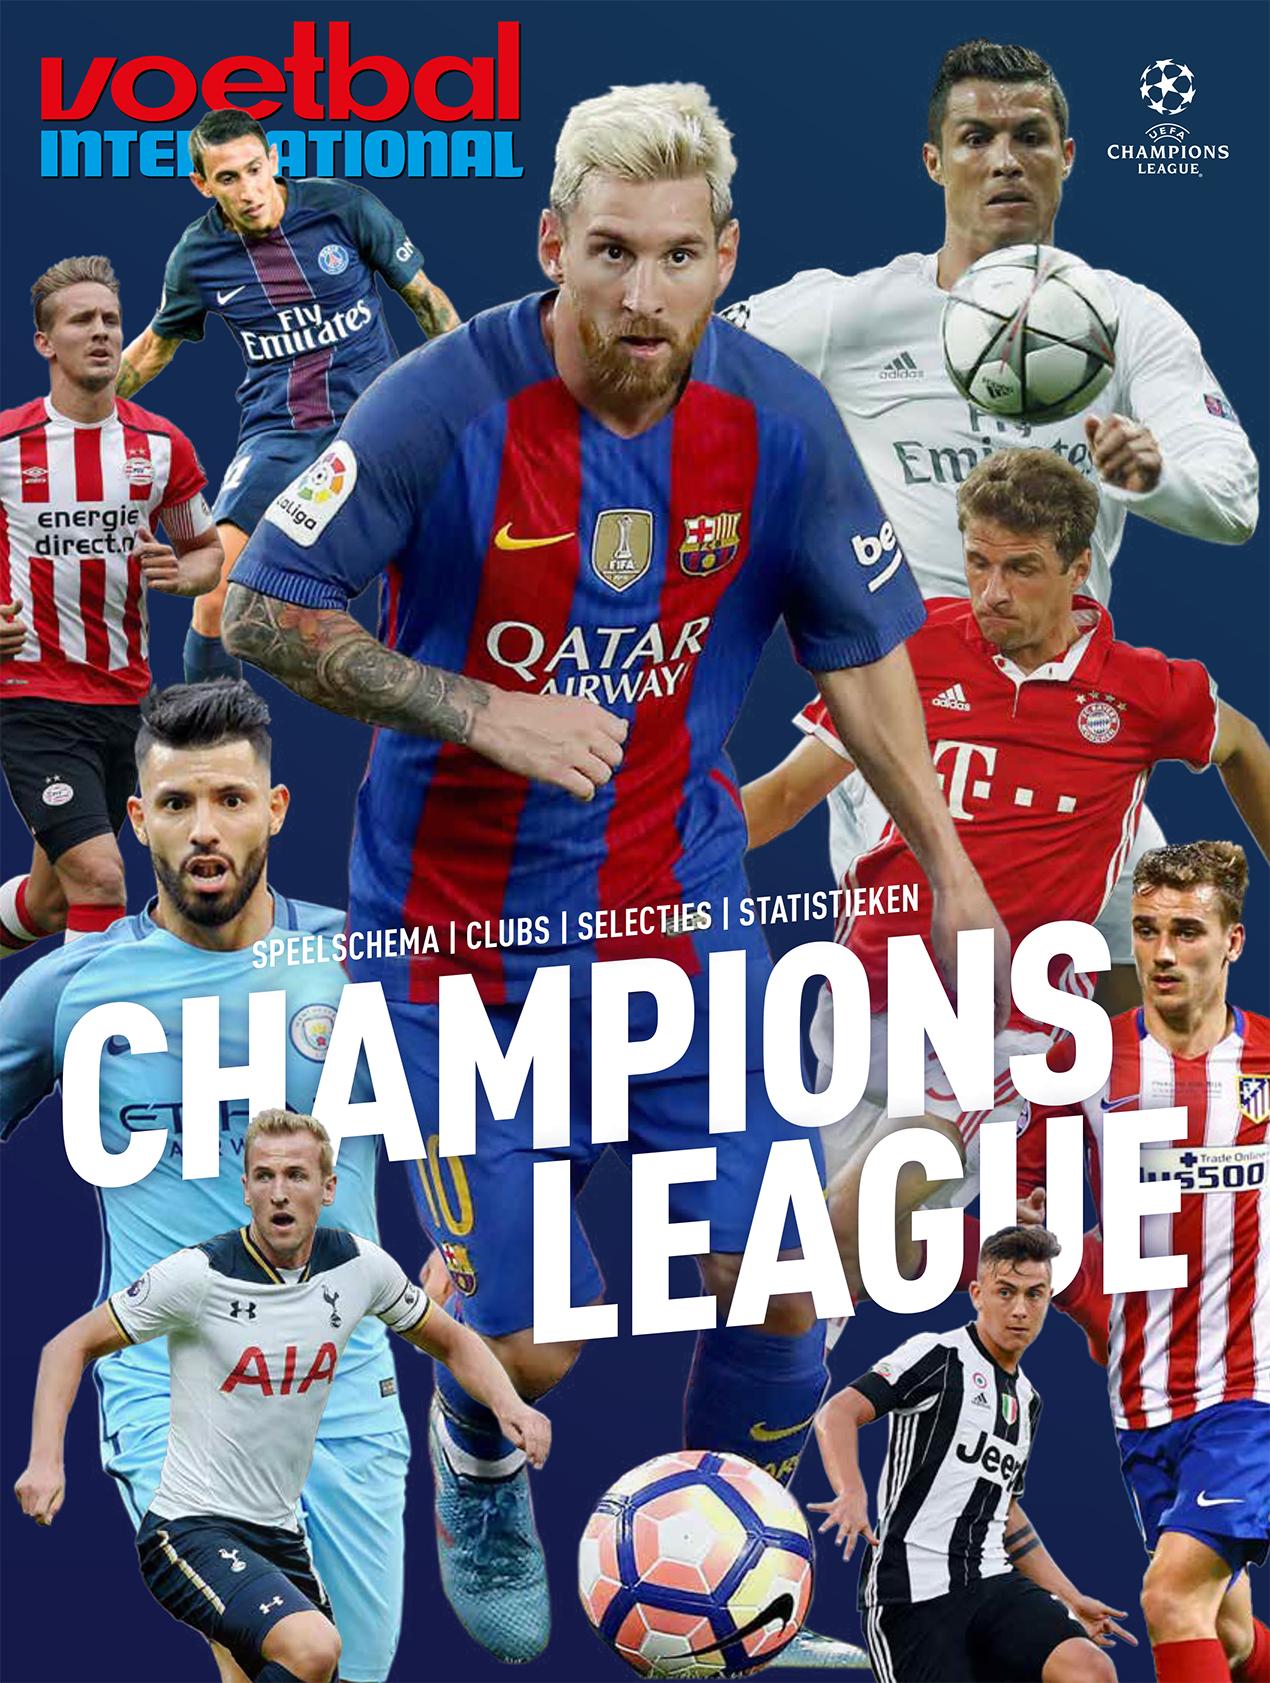 Cover bijlage Champions League